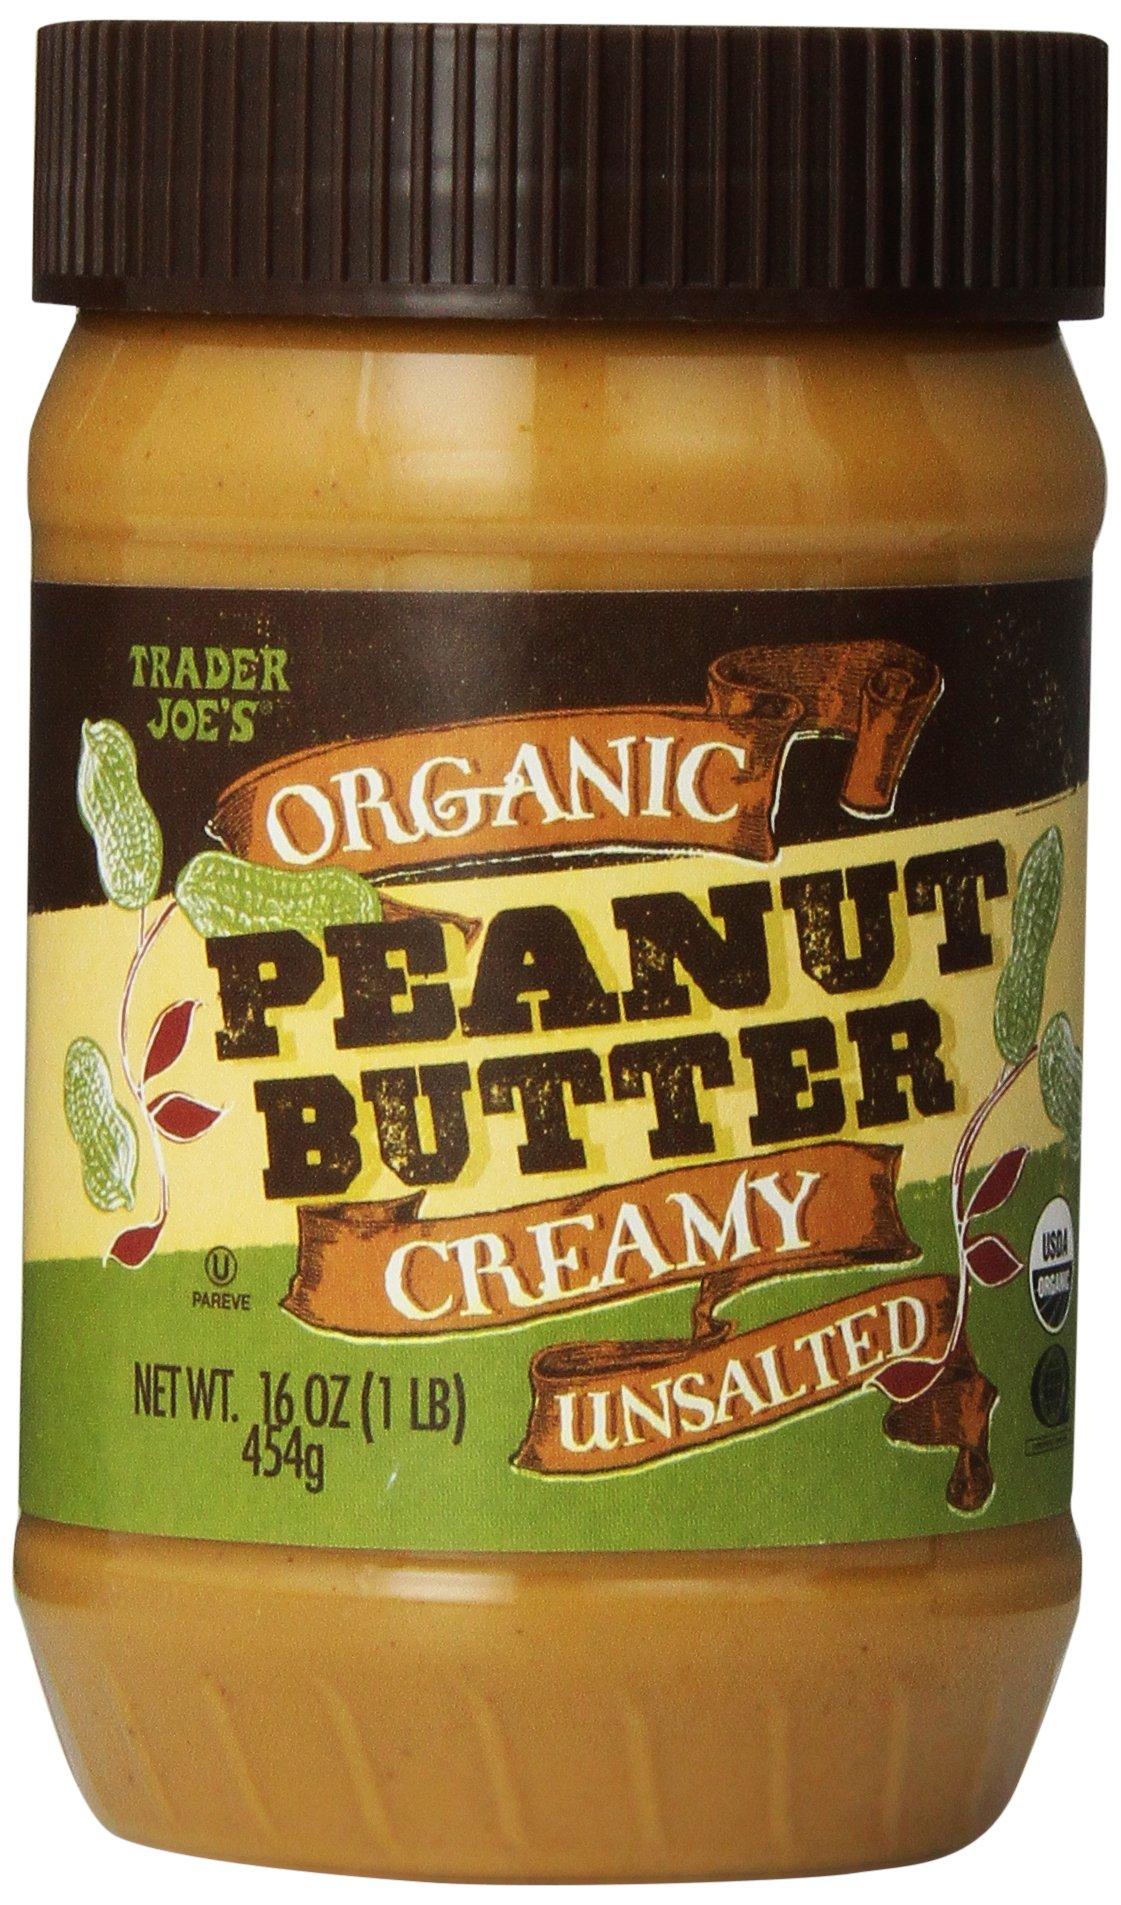 Trader Joe's Organic Peanut Butter Creamy Unsalted 16 Oz